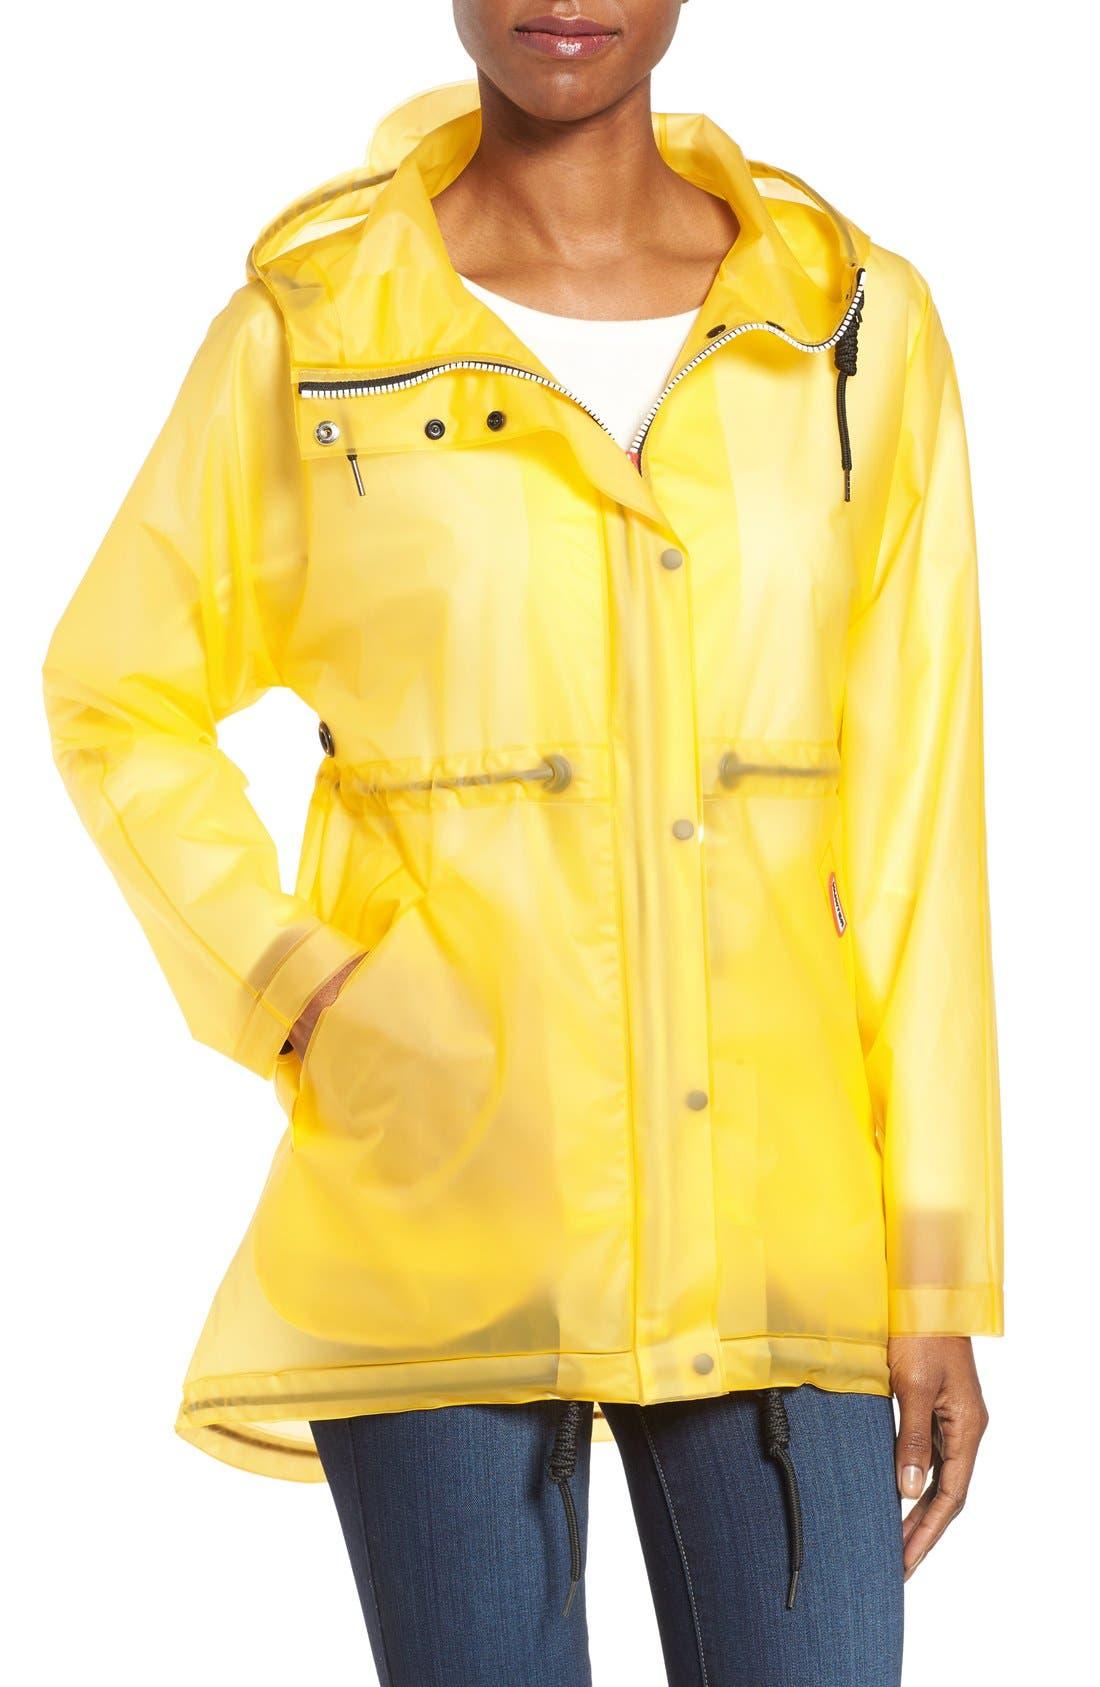 Hunter 'Original Smock' Hooded Drawstring Waterproof Jacket